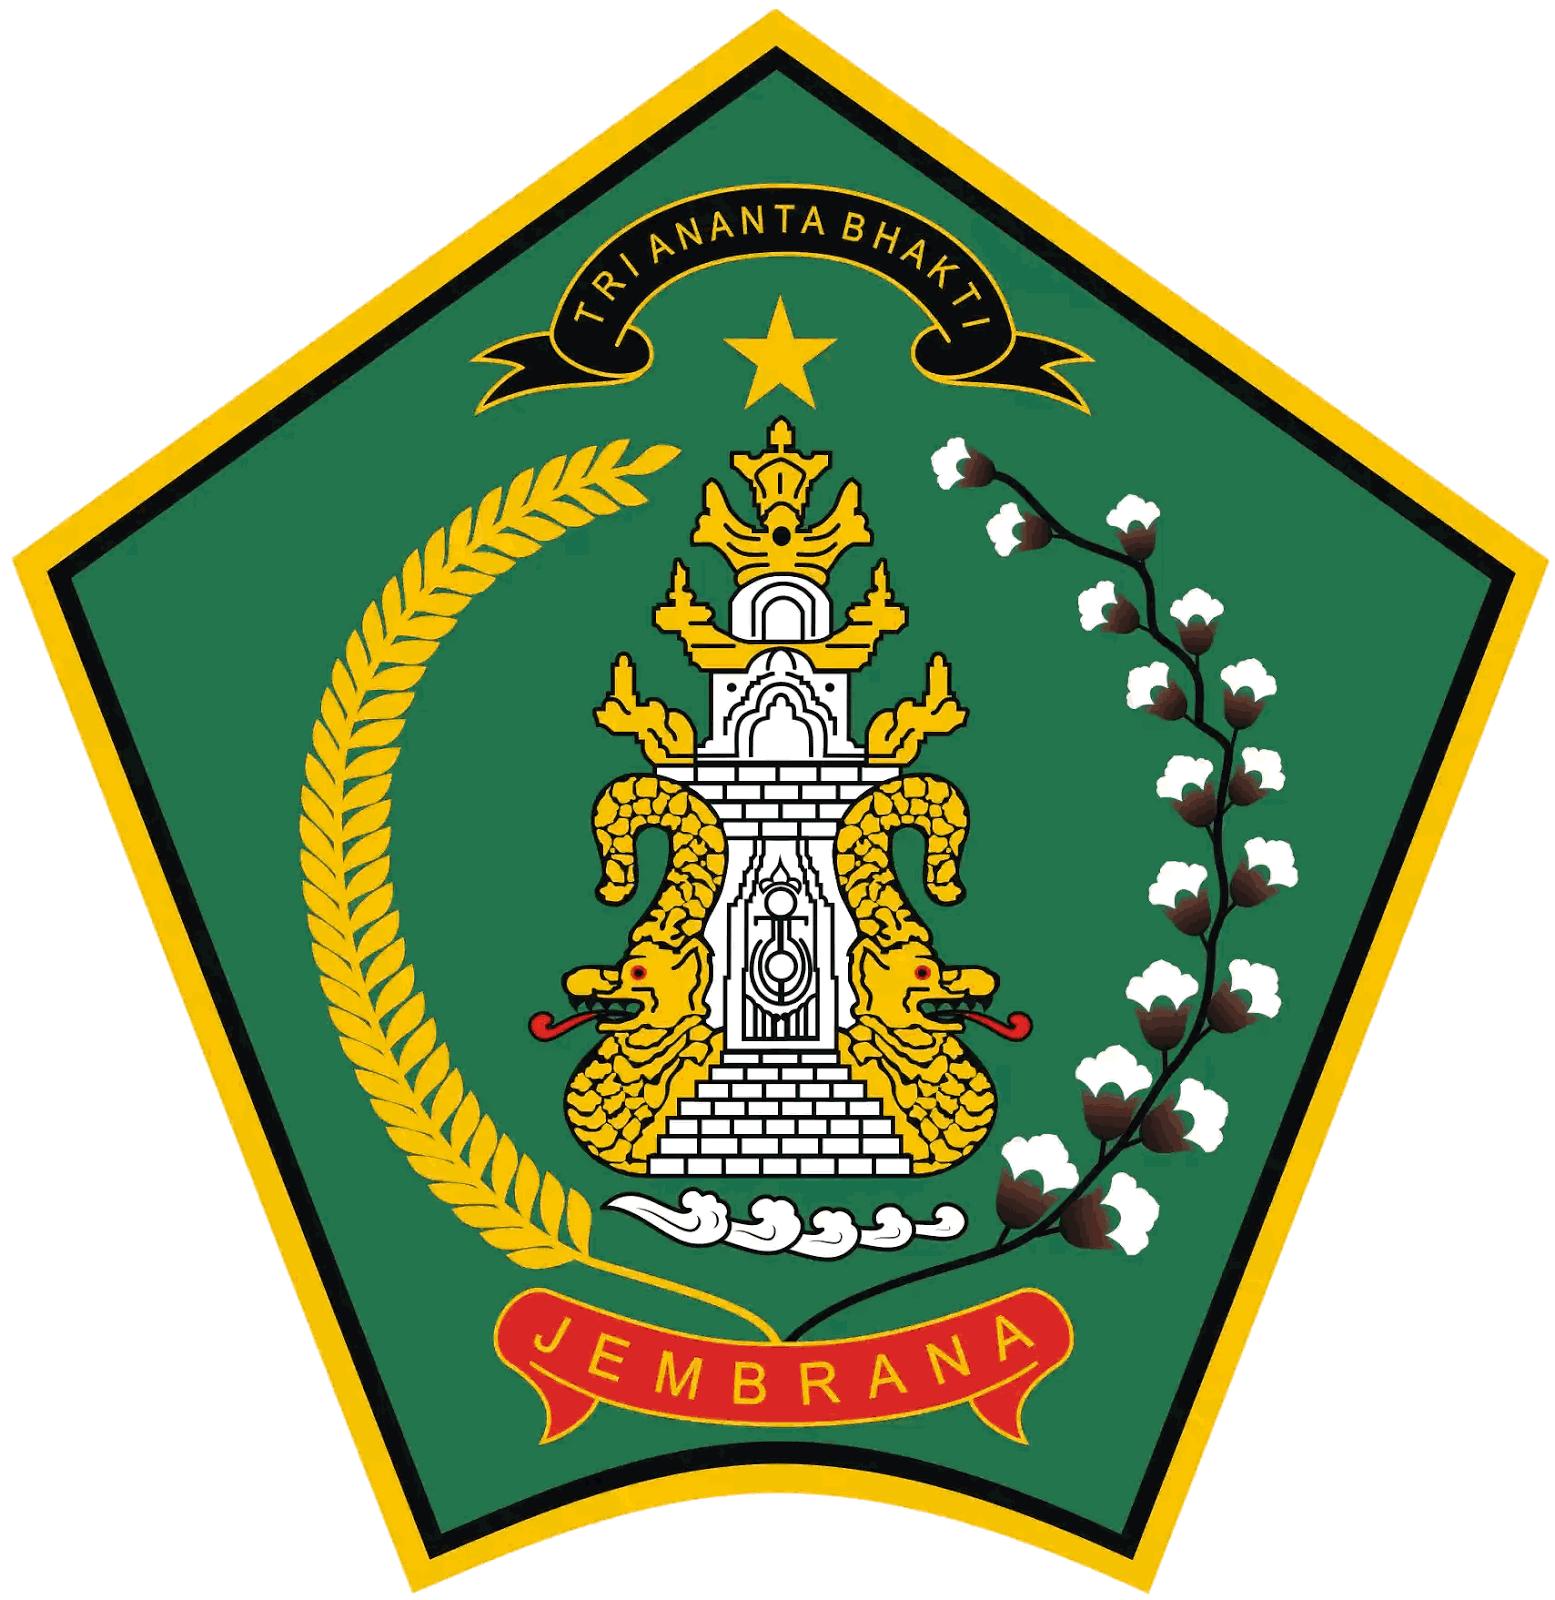 Berkas Lambang Kab Jembrana Png Wikipedia Bahasa Indonesia Ensiklopedia Bebas